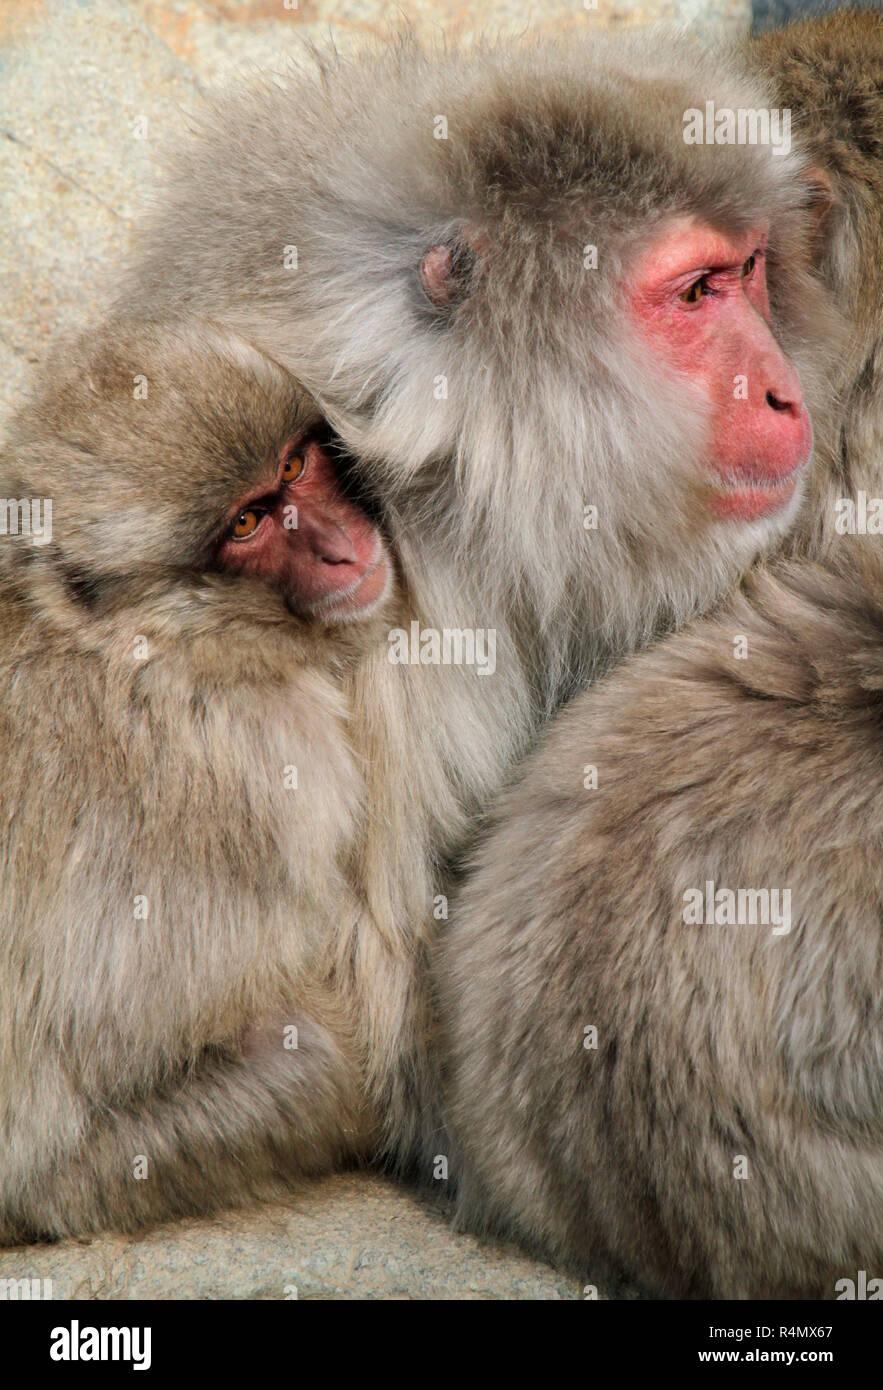 Familia De Monos De Nieve Japonés Caricias Arriba Foto Imagen De